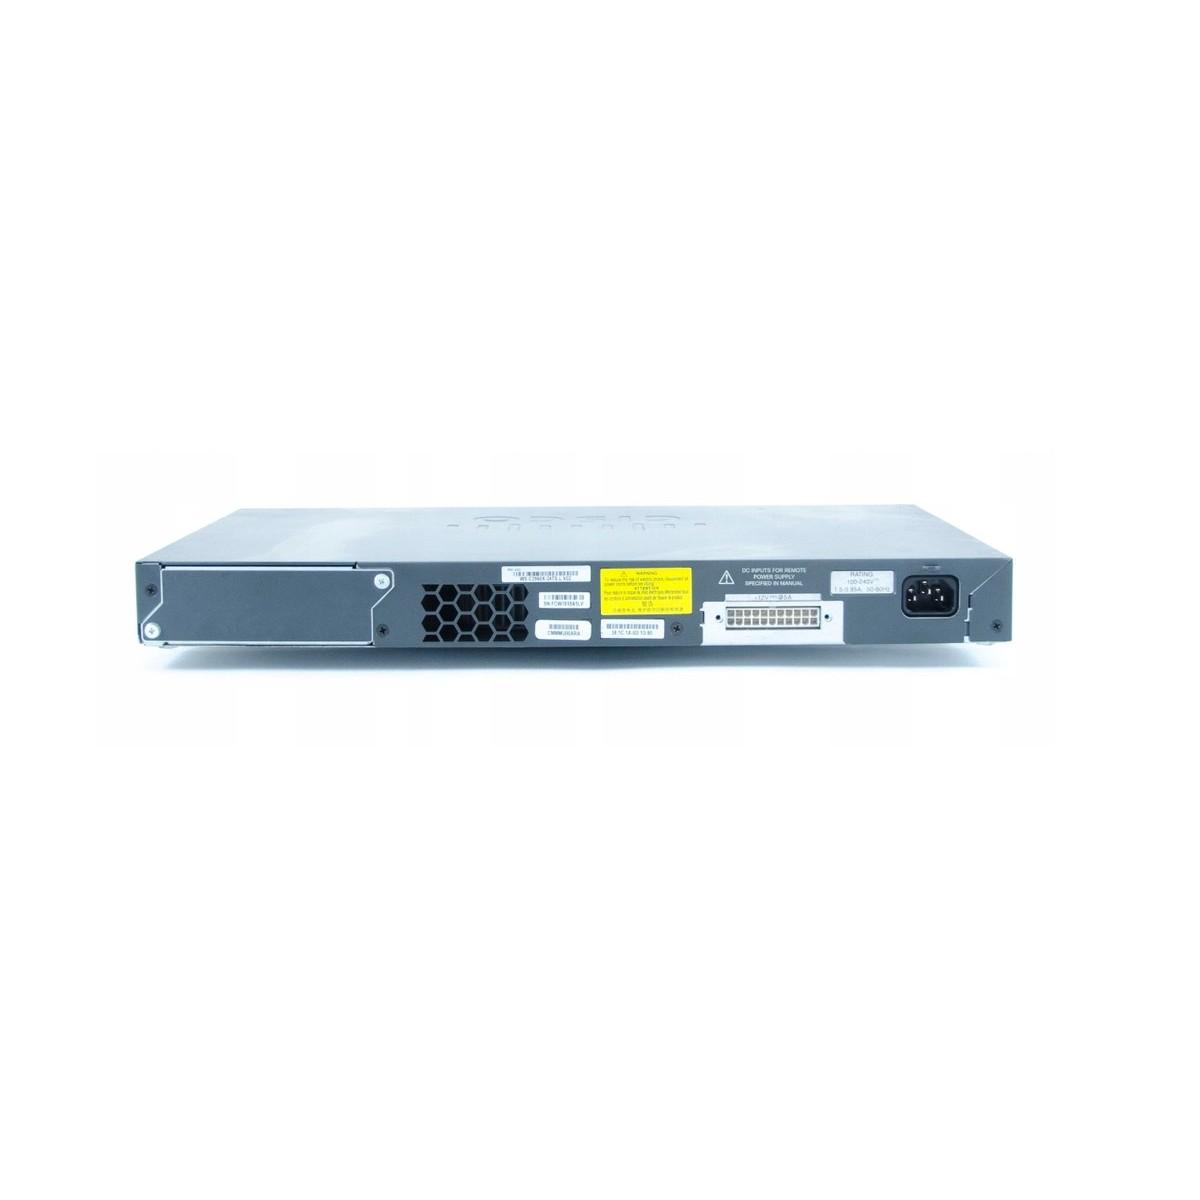 IBM pSeries 570 2x2,2GHZ Power5+/64GB/292GB/COMBO